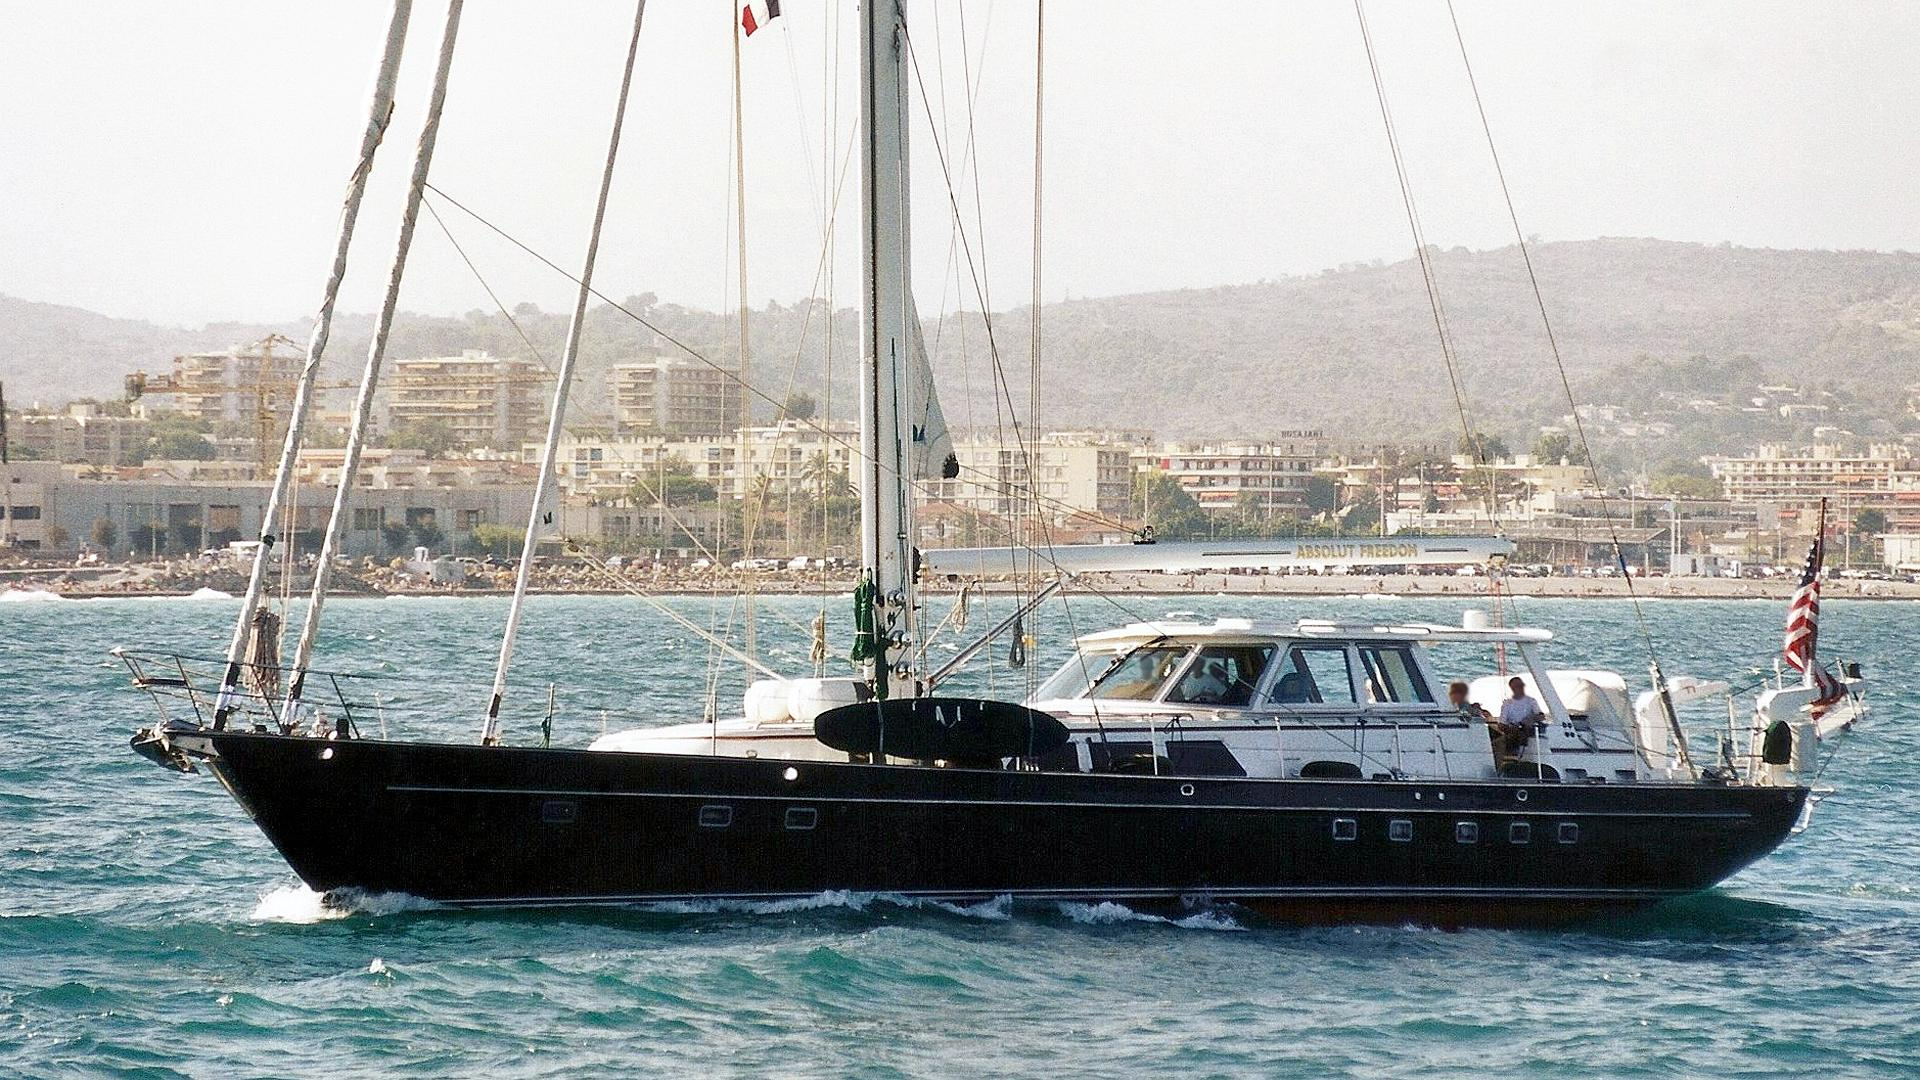 absolut-freedom-sailing-yacht-formosa-bb-us-mediterranean-86-1987-27m-profile